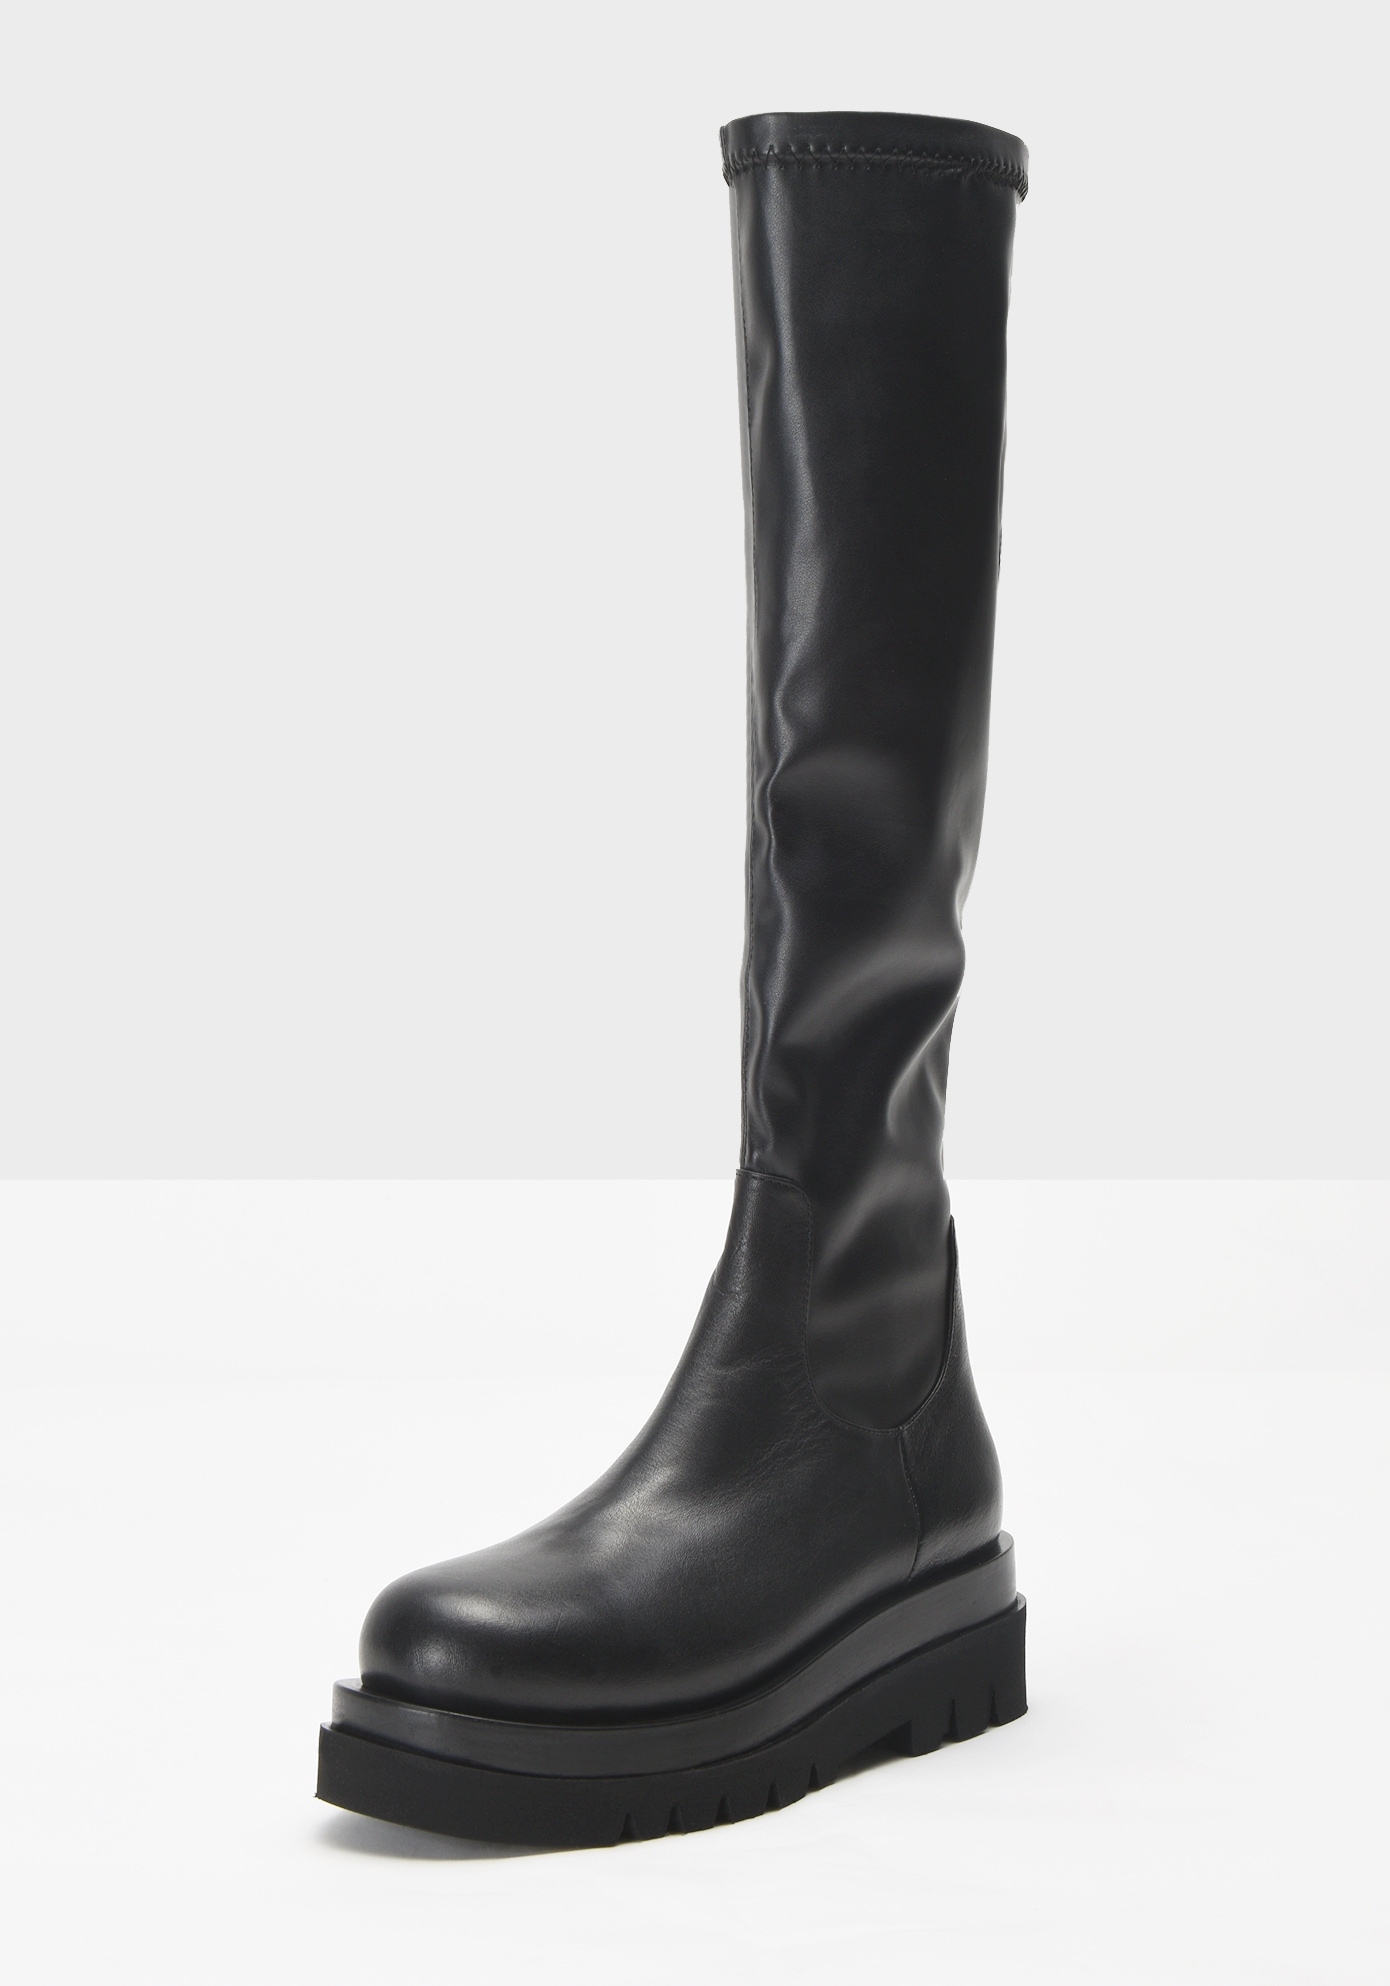 inuovo -  Stiefel Leder